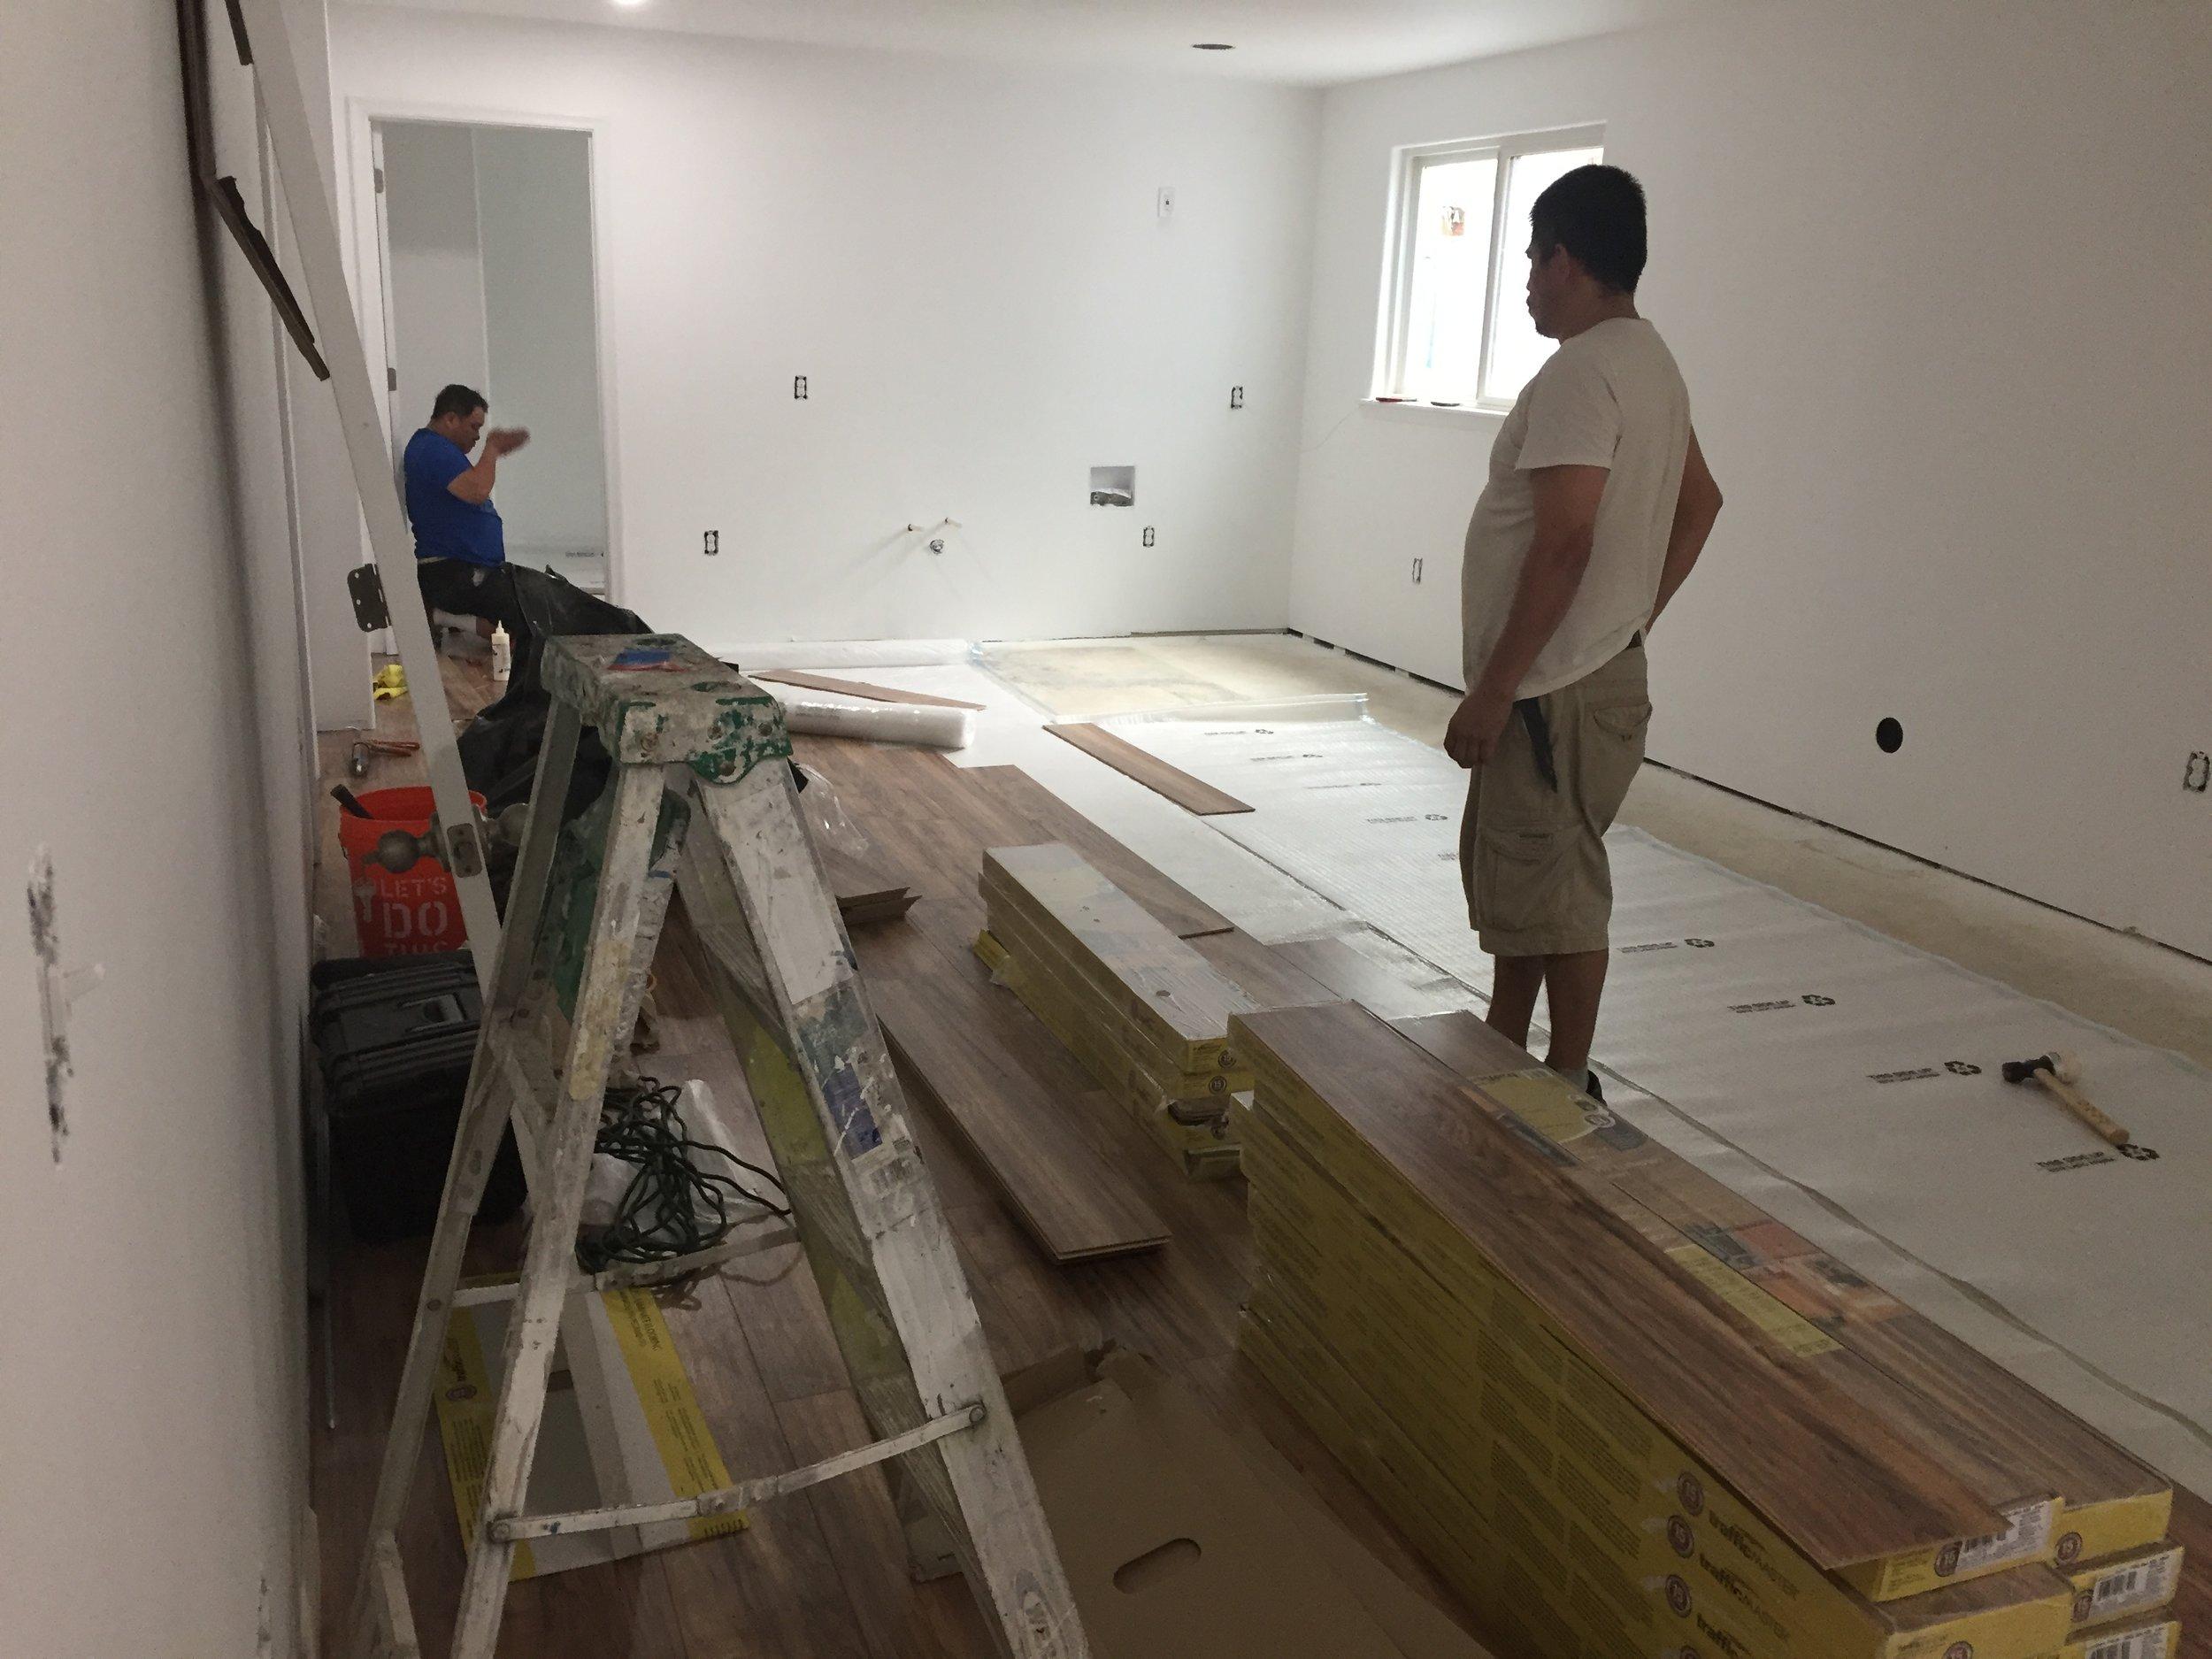 Basement flooring being installed.